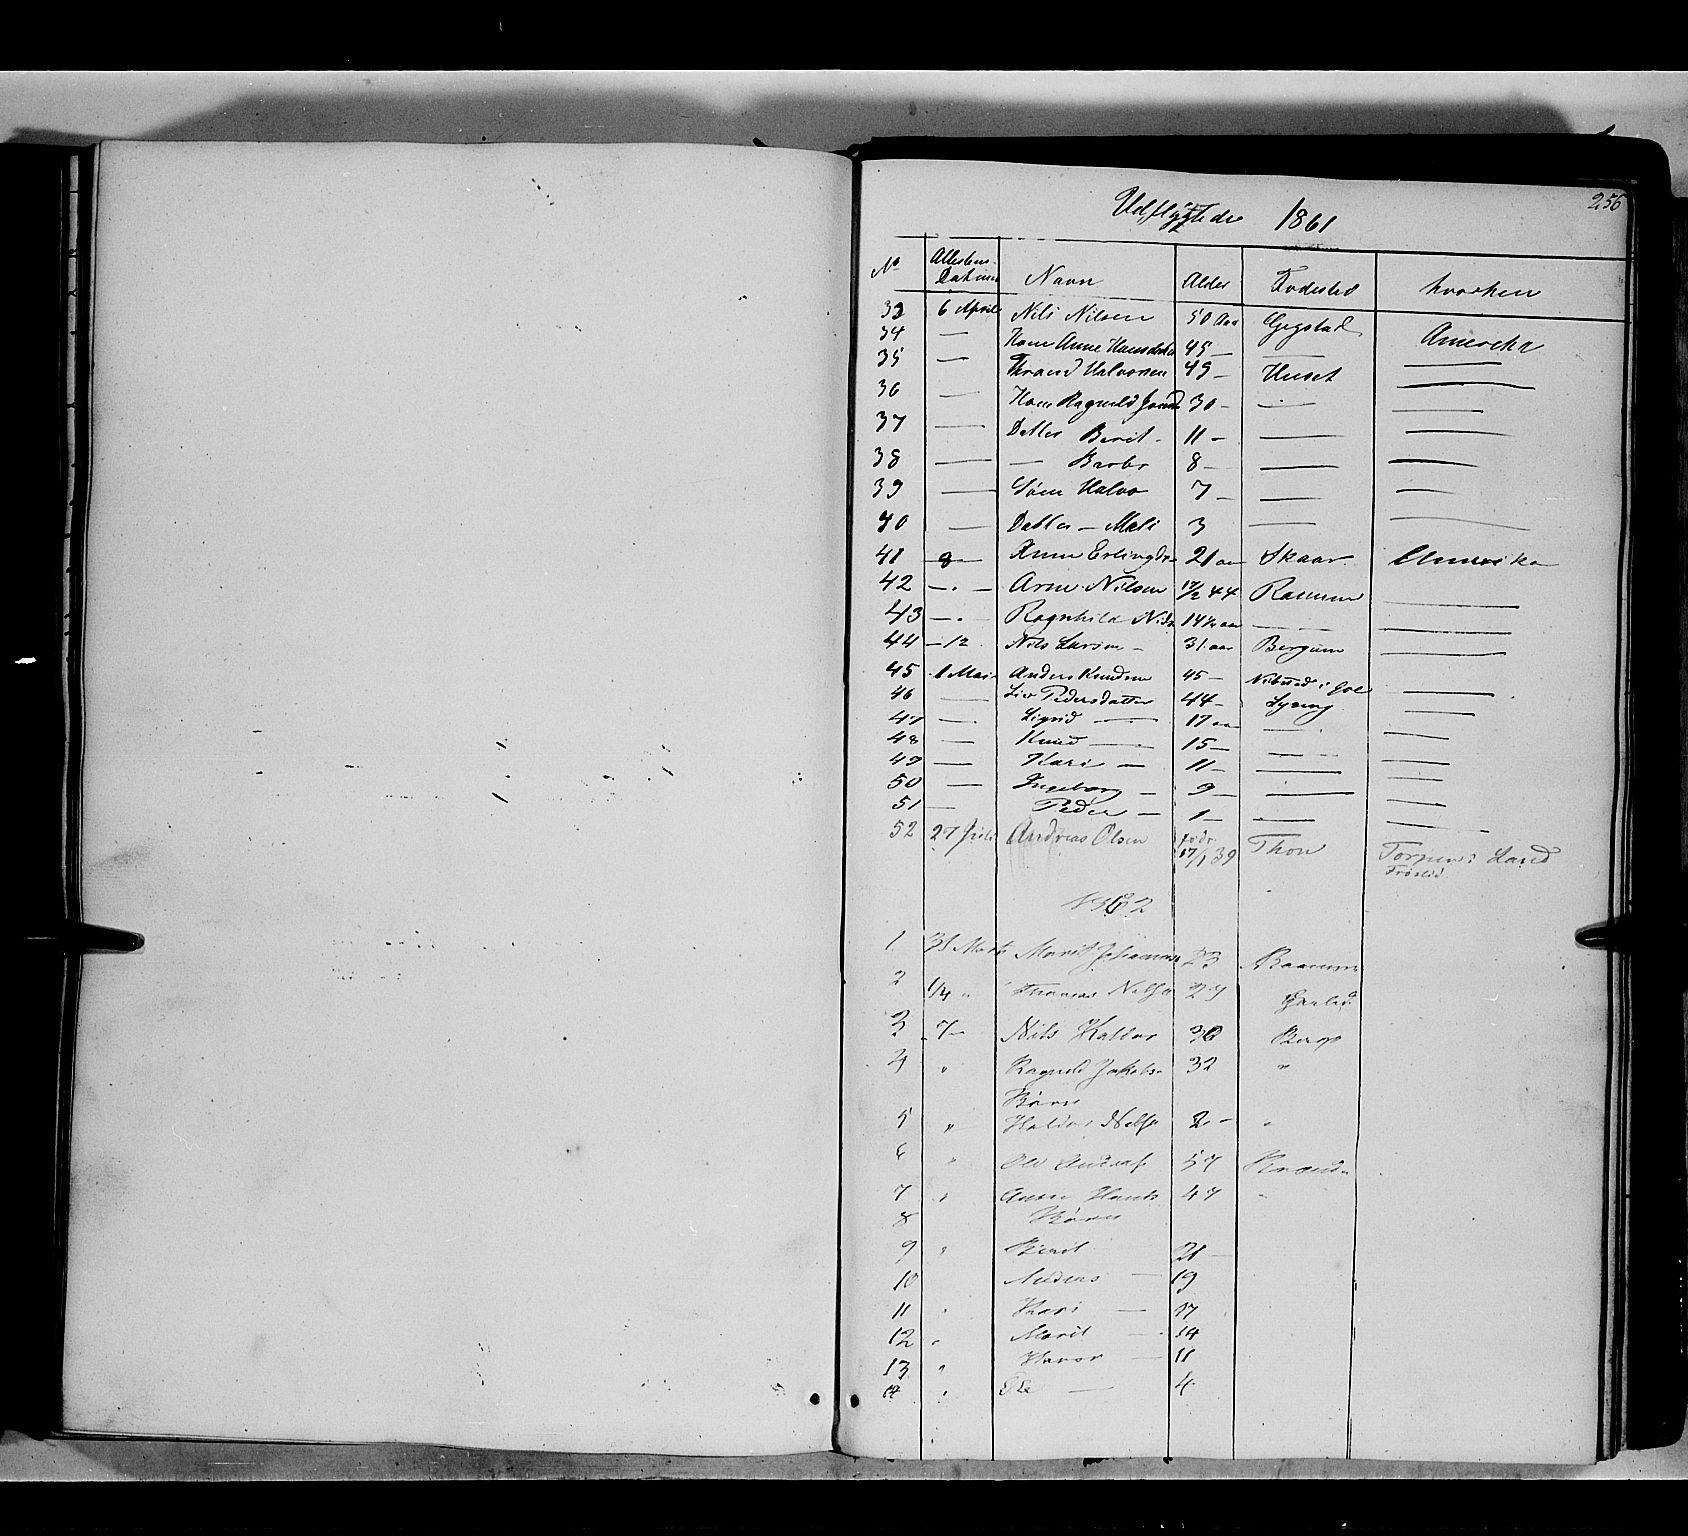 SAH, Nord-Aurdal prestekontor, Ministerialbok nr. 7, 1842-1863, s. 256